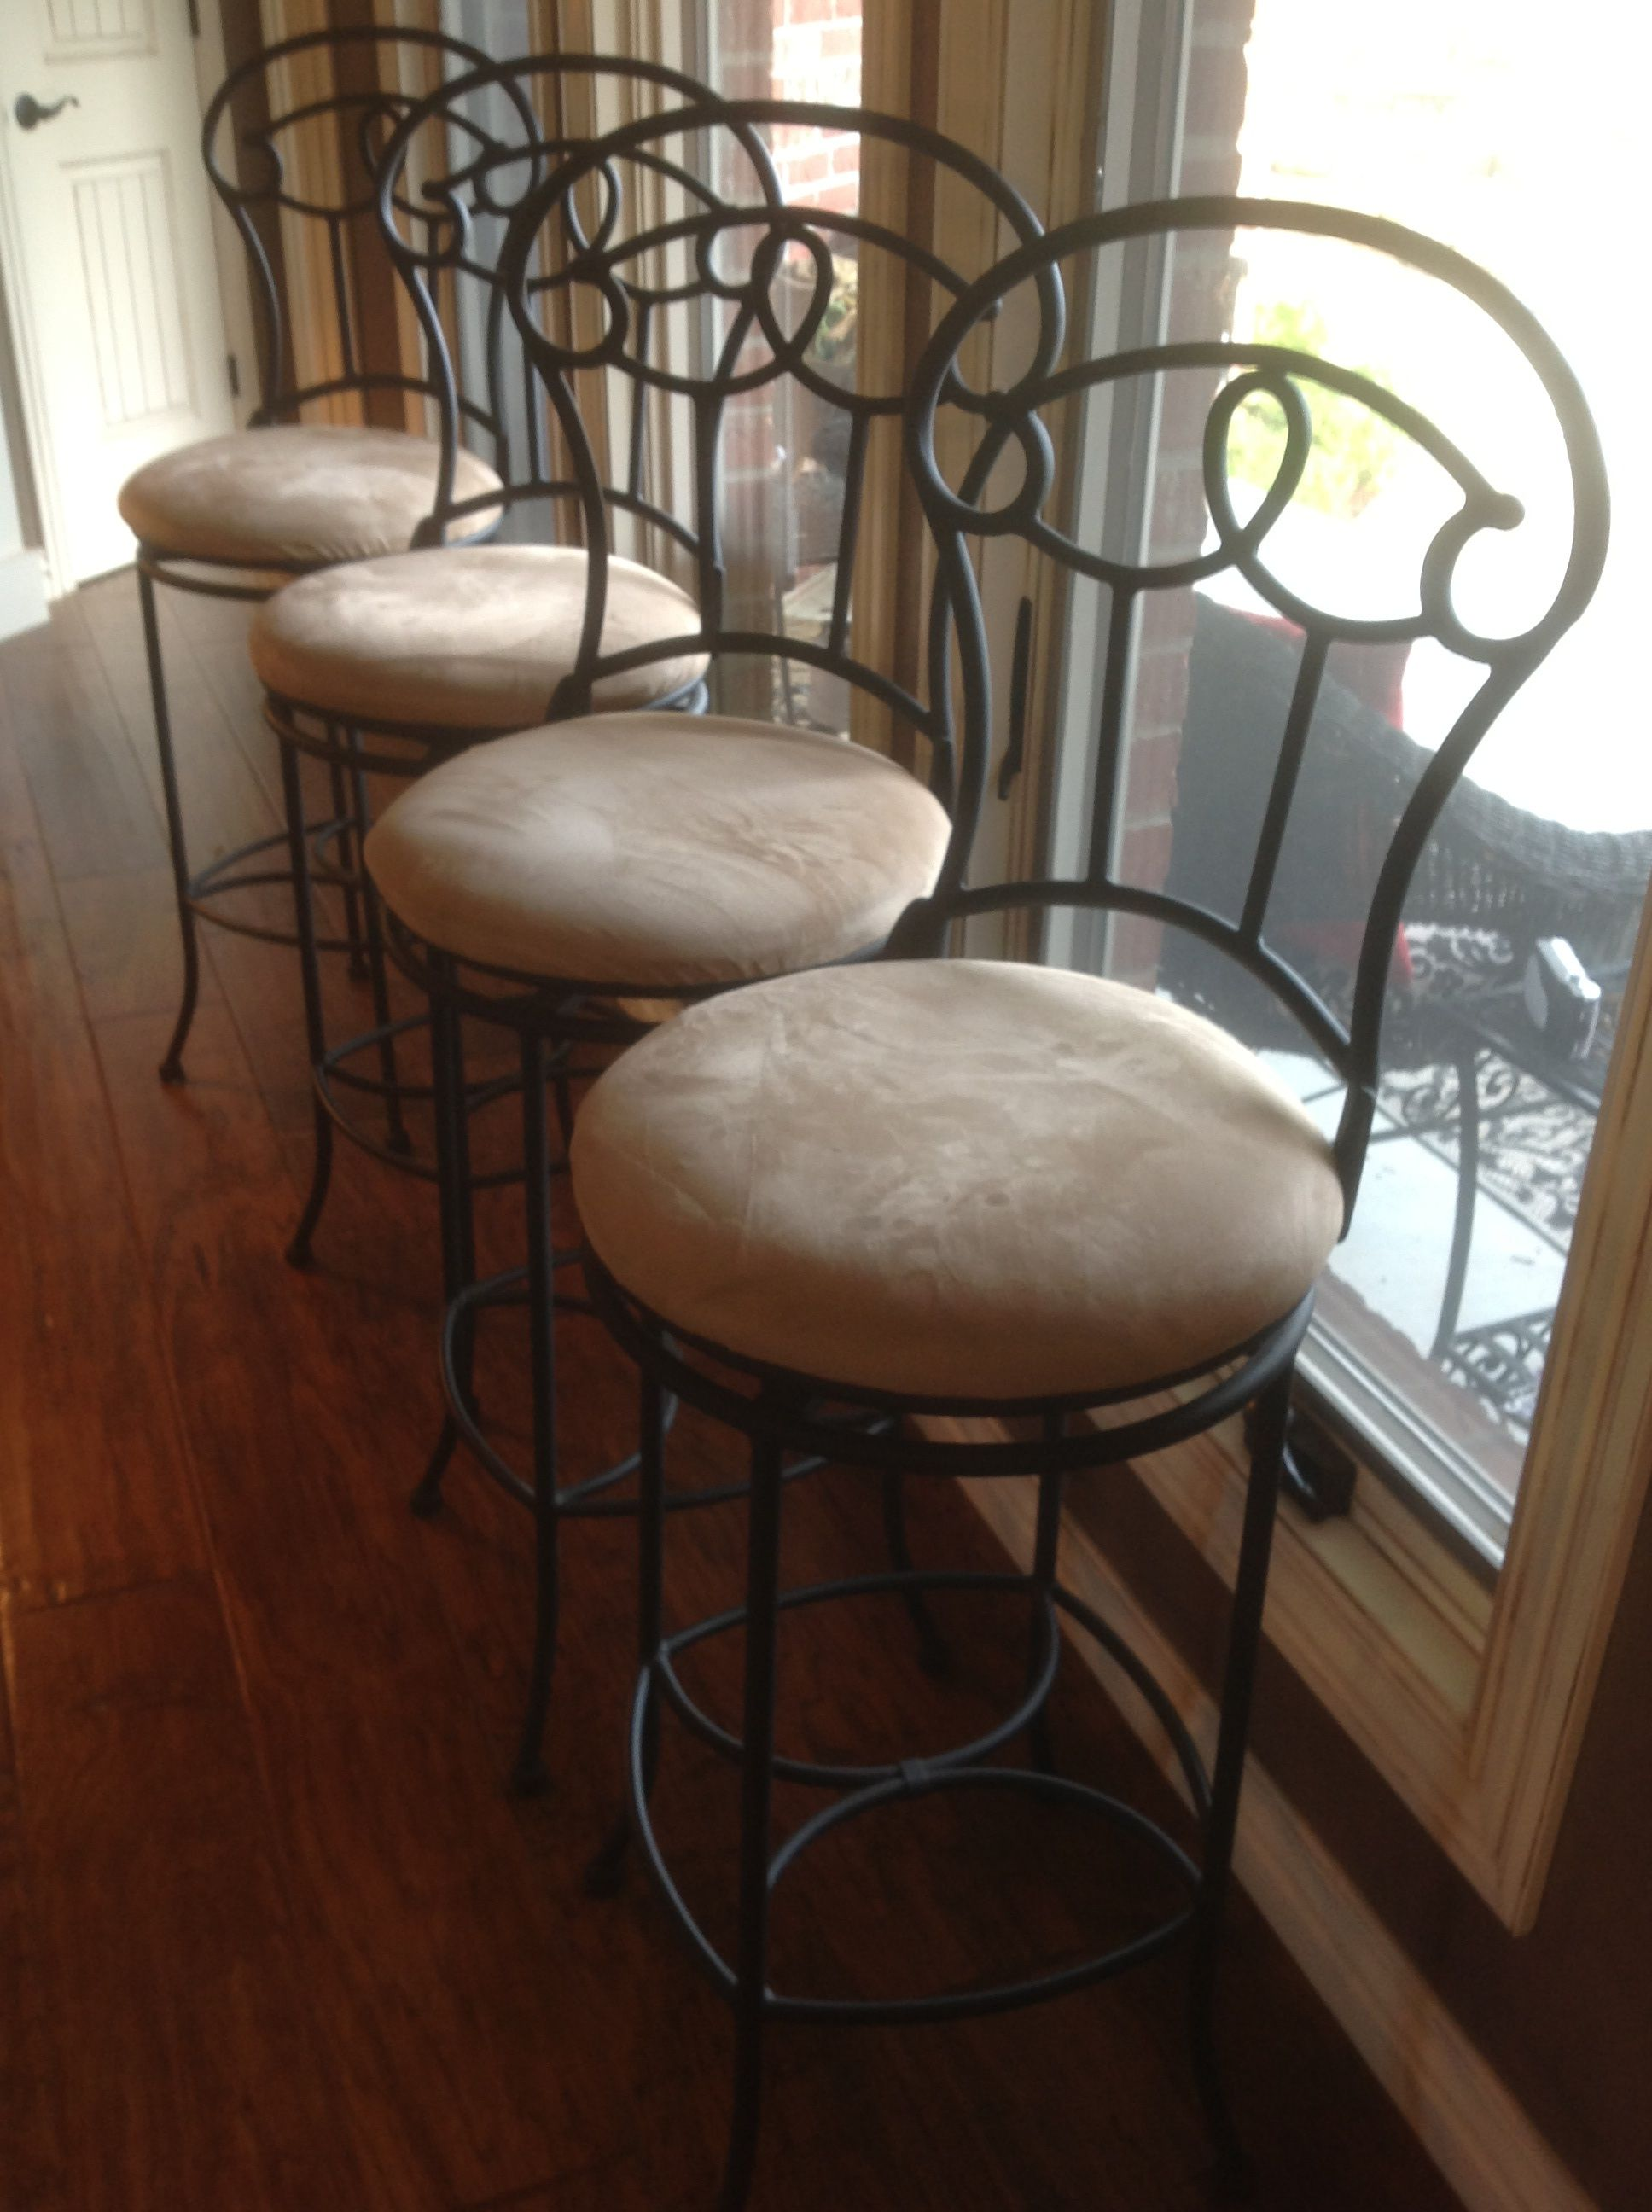 Bar height bar stools-set of 4 in Excesstreasures' Garage ...